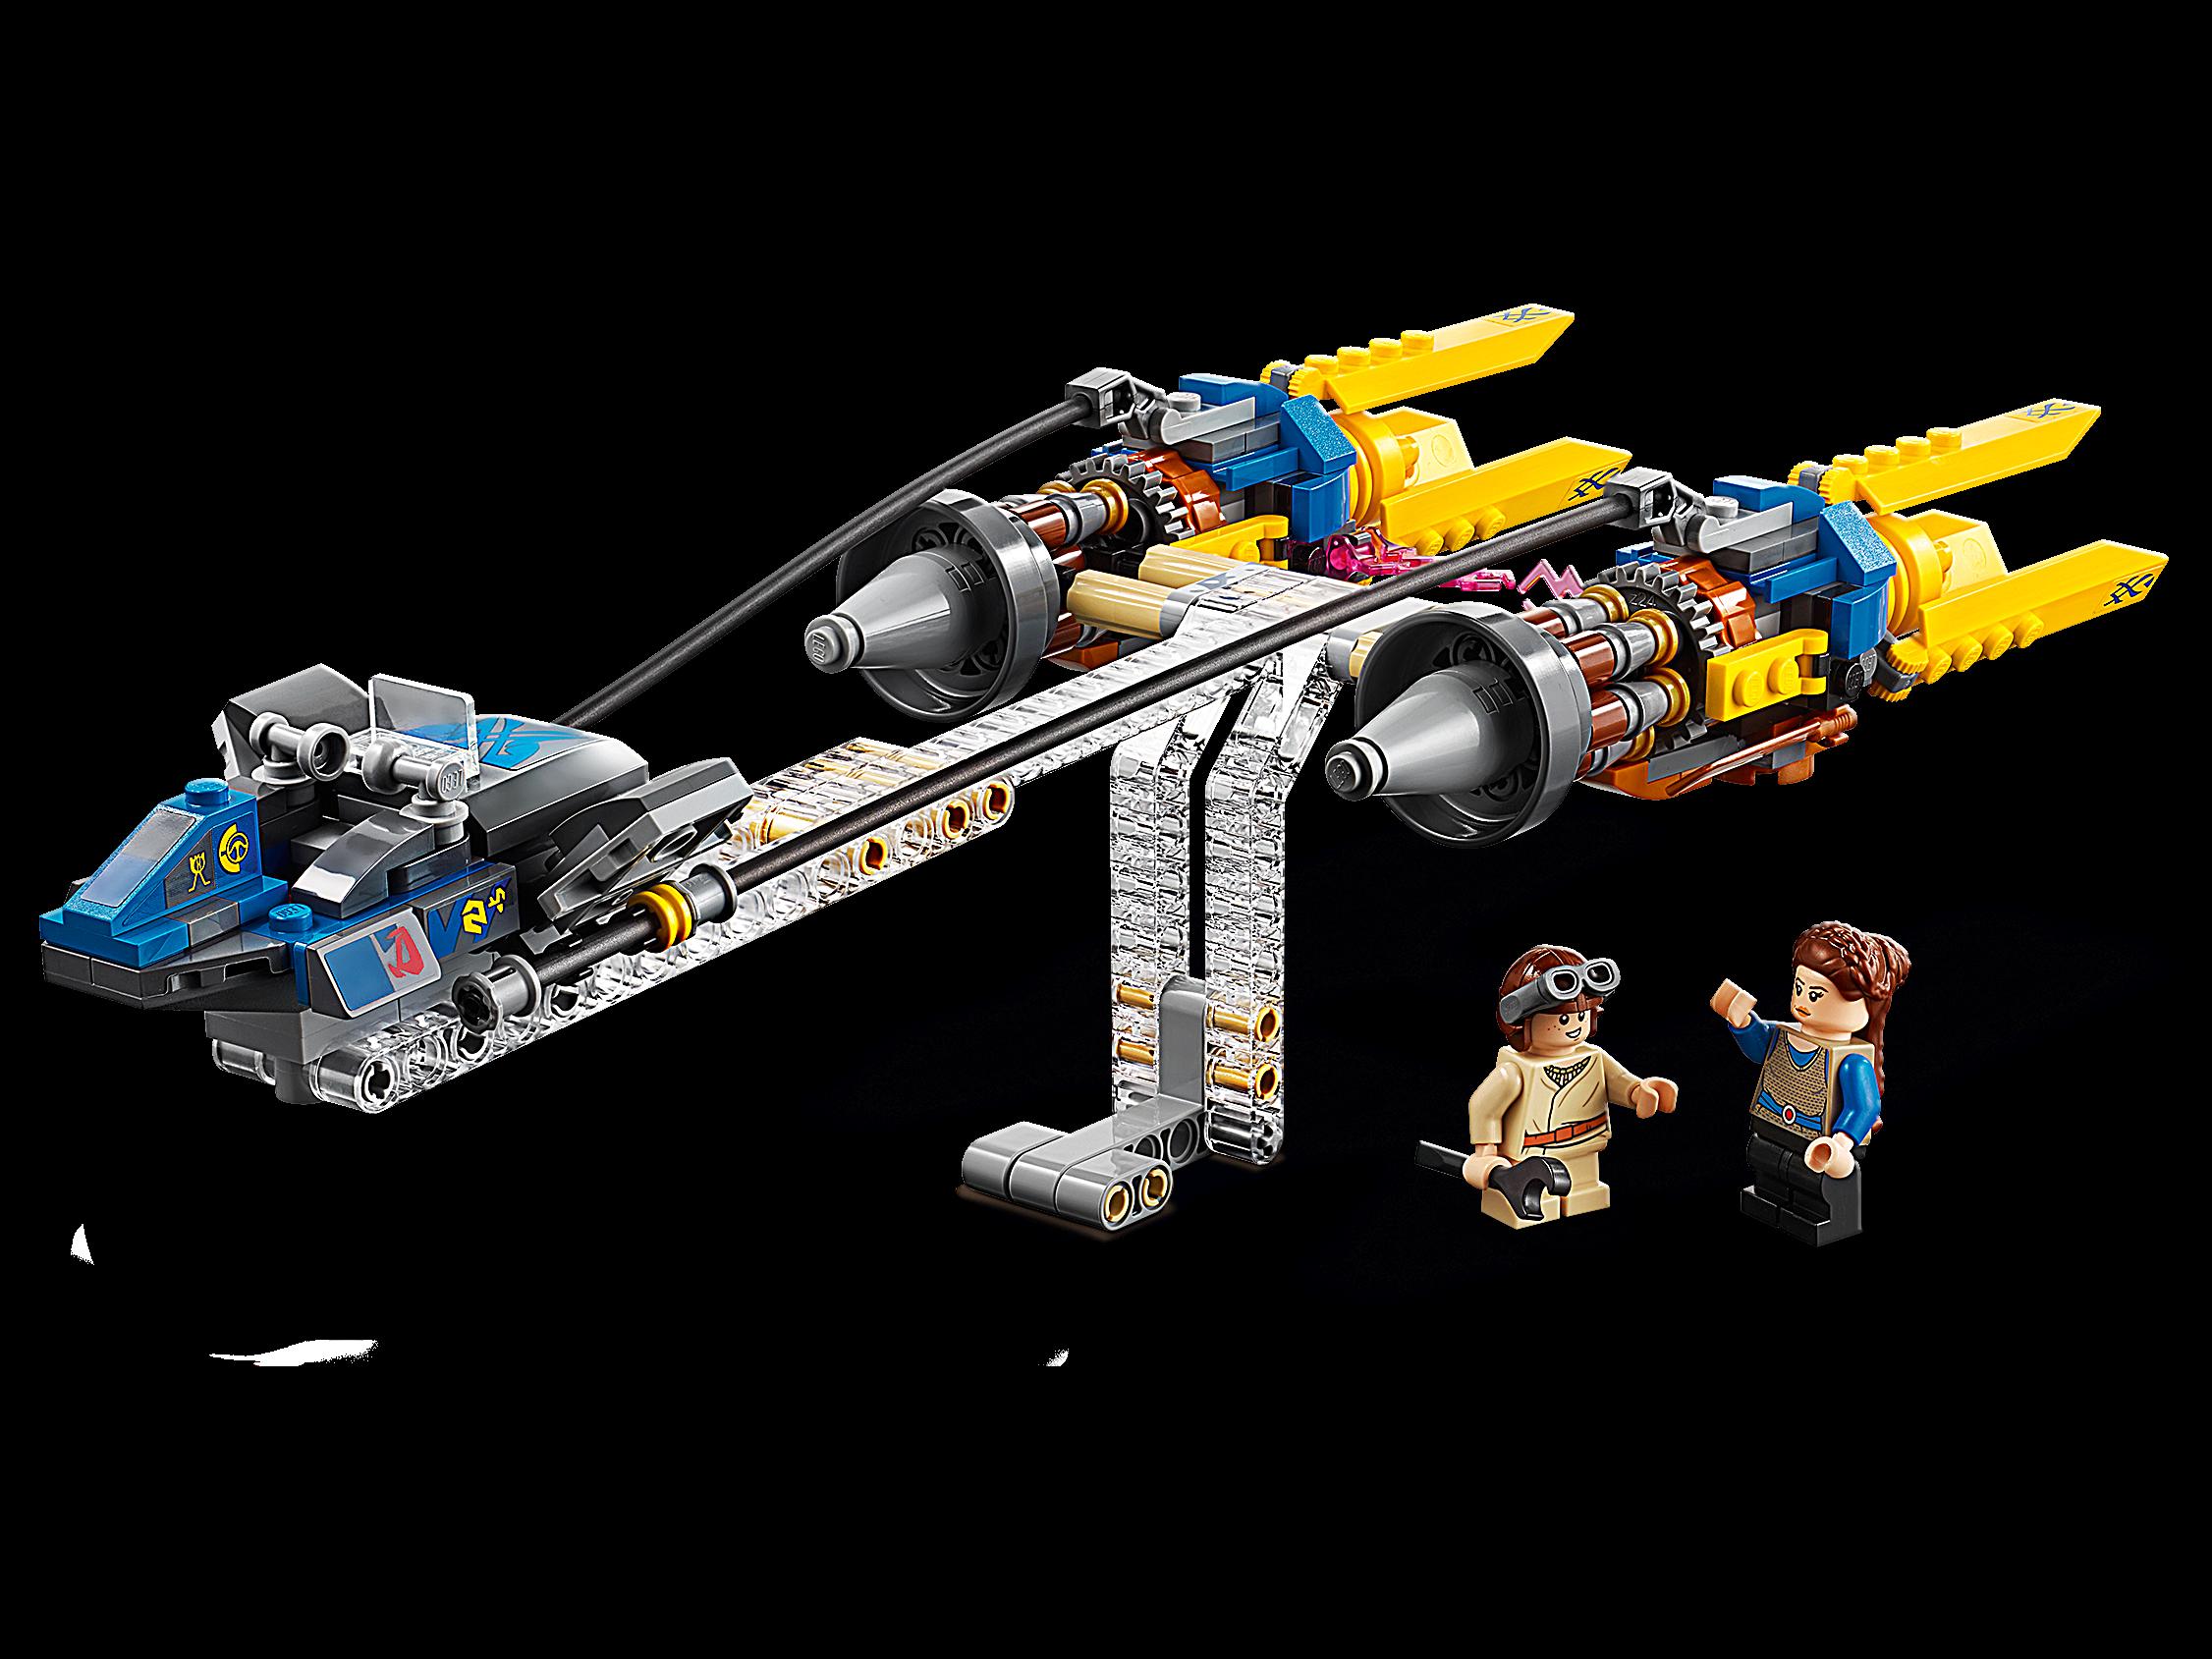 Star Wars ANAKIN/'S PODRACER 20th Anniversary Edition Lego NEW 75258